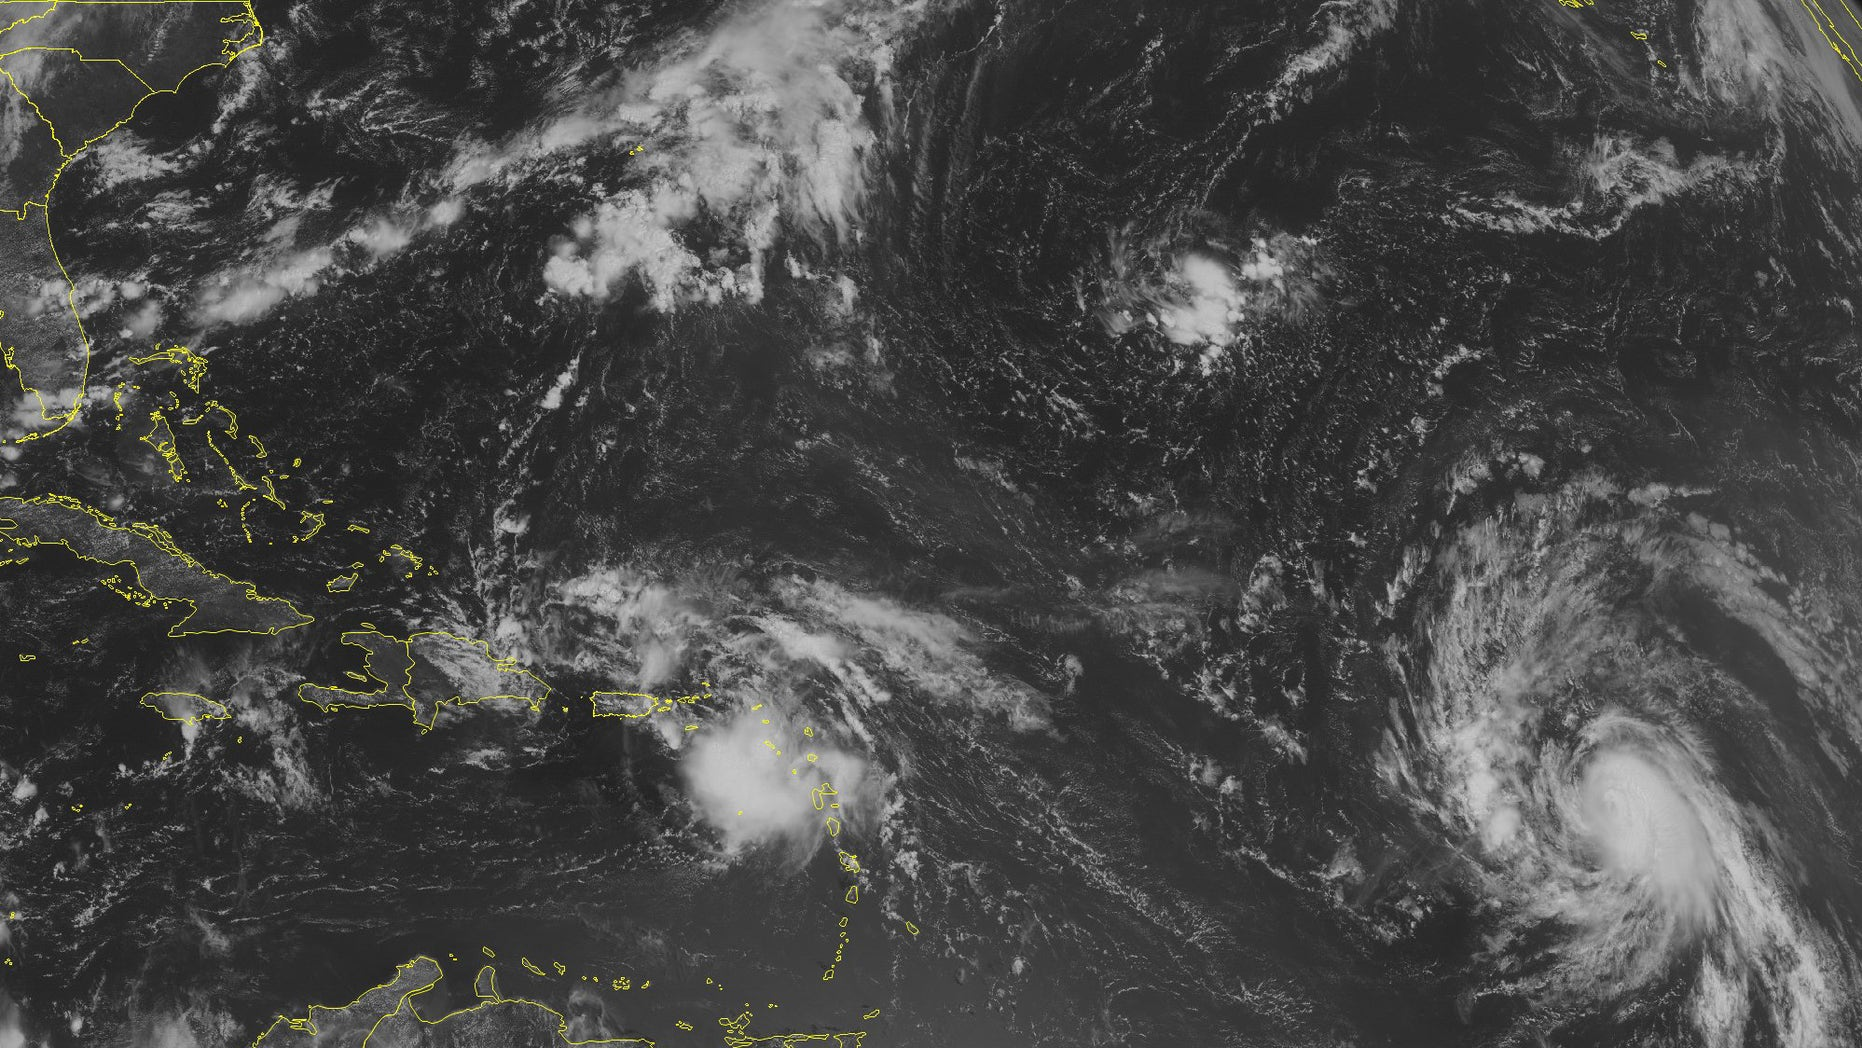 NOAA satellite image taken Wednesday, Aug. 24, 2016. at 9:45 a.m. EDT. over the northeastern Caribbean Sea.